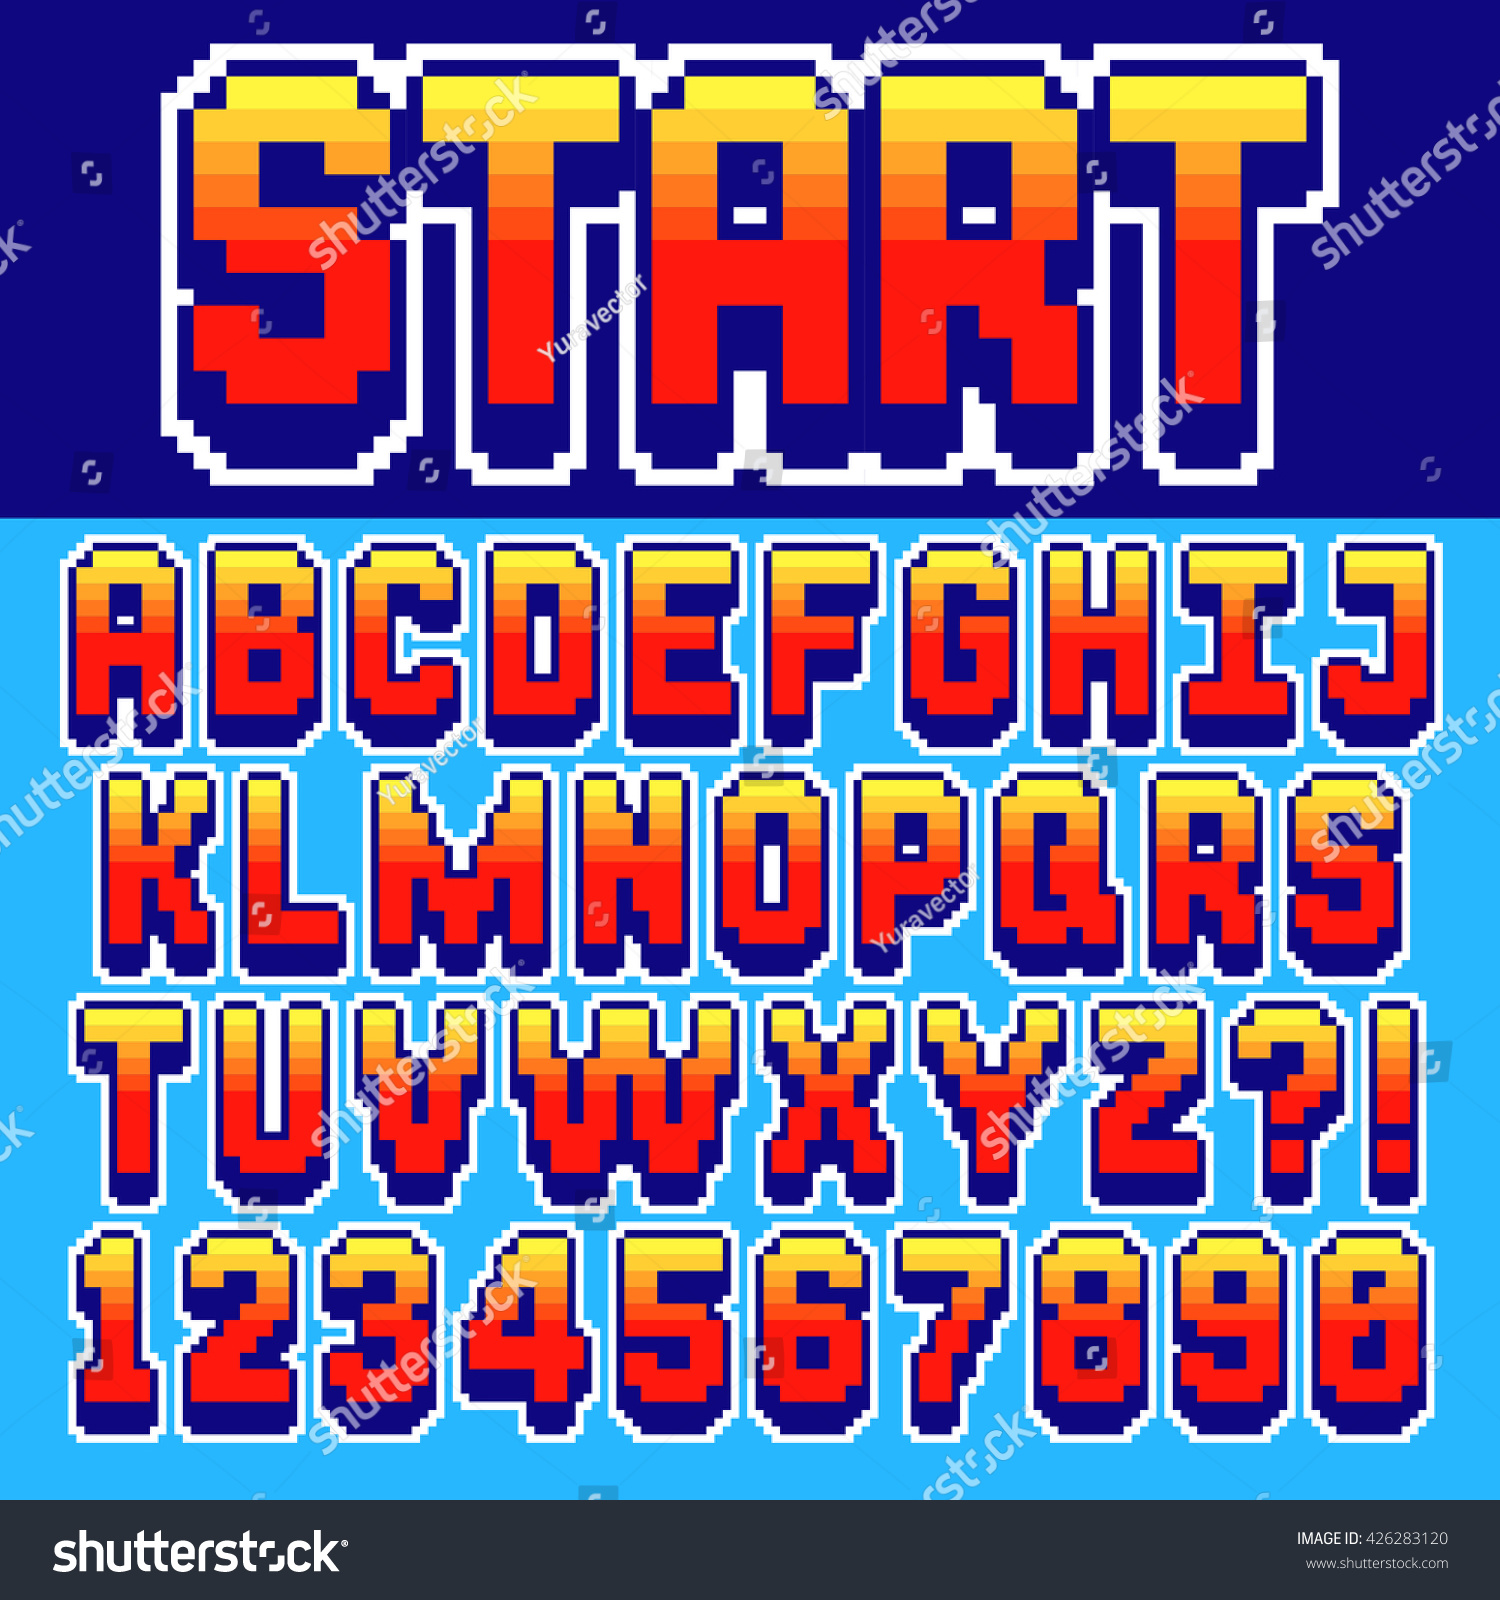 Pixel Retro Font Video Computer Game Stock Vector